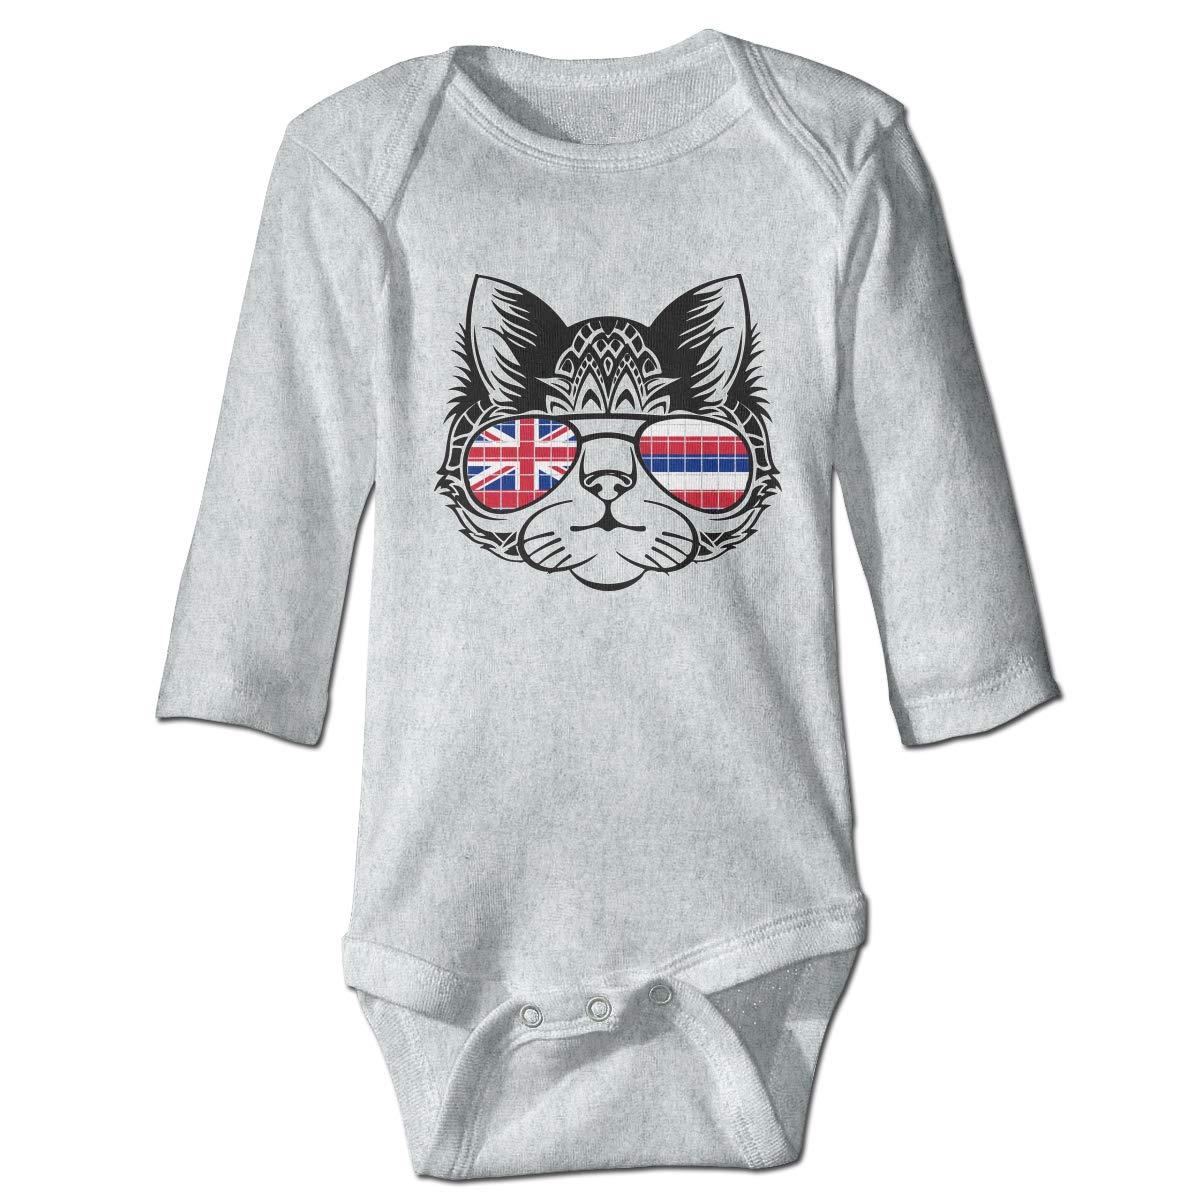 Newborn Baby Boys Girls Romper Bodysuit Jumpsuit Cat Wearing Hawaii Flag Sunglasses Long Sleeve Funny Climb Romper